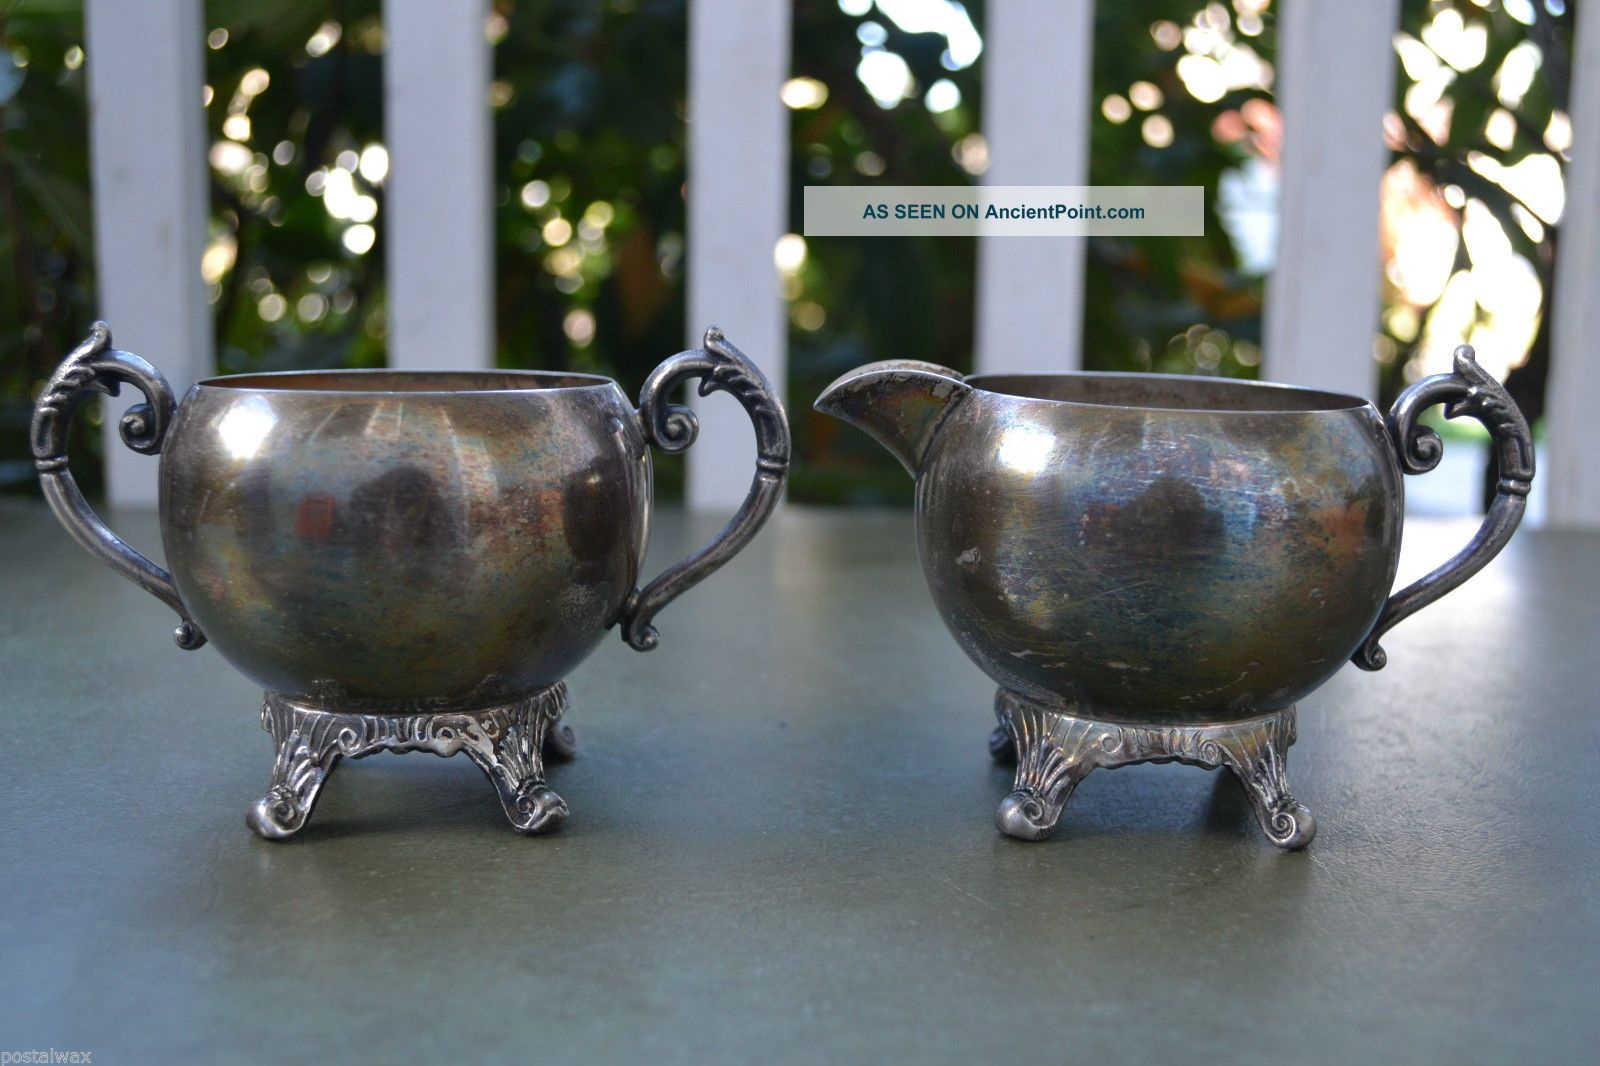 Adh 19th Cent.  Unmarked Silver Plated Sugar Bowl & Creamer Set Creamers & Sugar Bowls photo